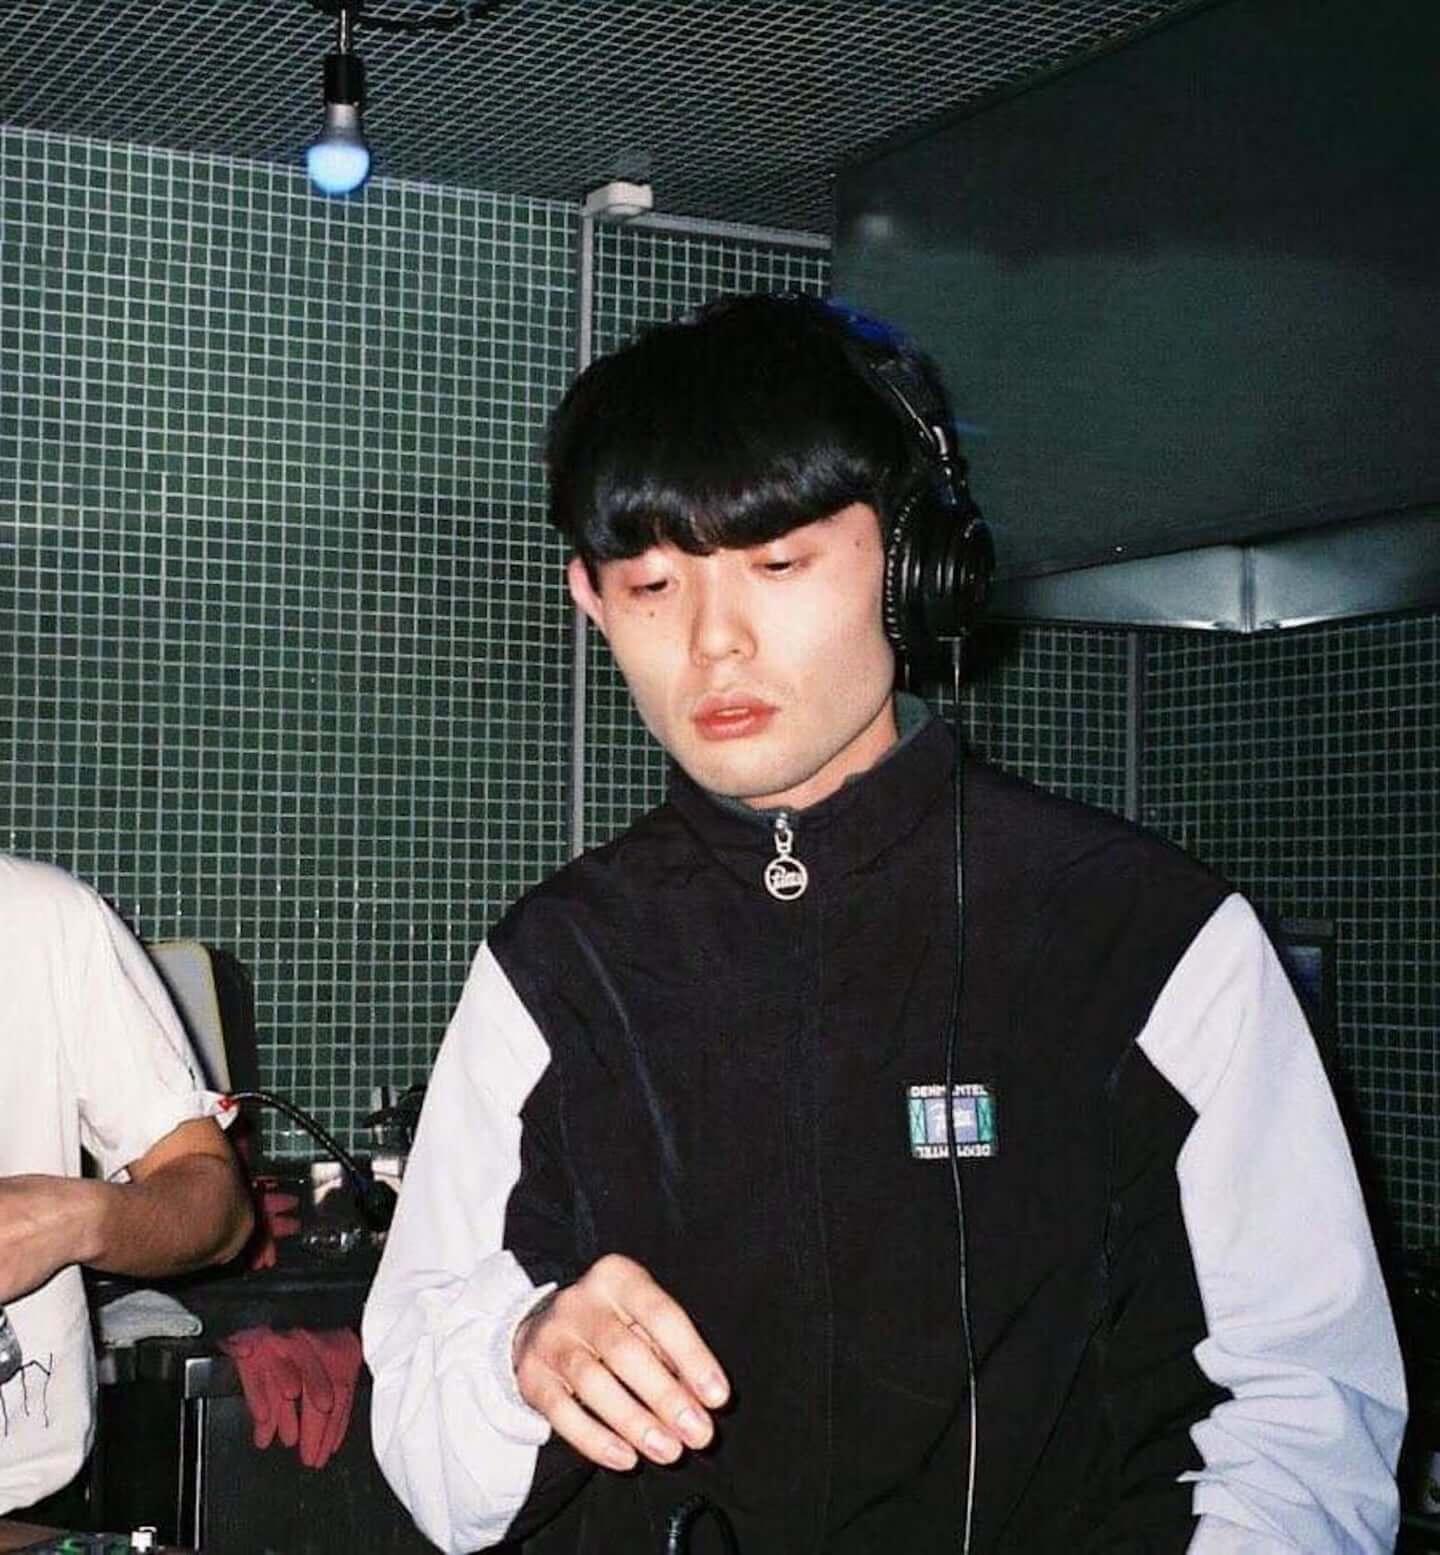 J-WAVEを偏愛するリスナーに向けてのサマーイベント<J-WAVE SUMMER NIGHT feat TOKYO M.A.A.D SPIN>が開催決定 Kotsu-1440x1555